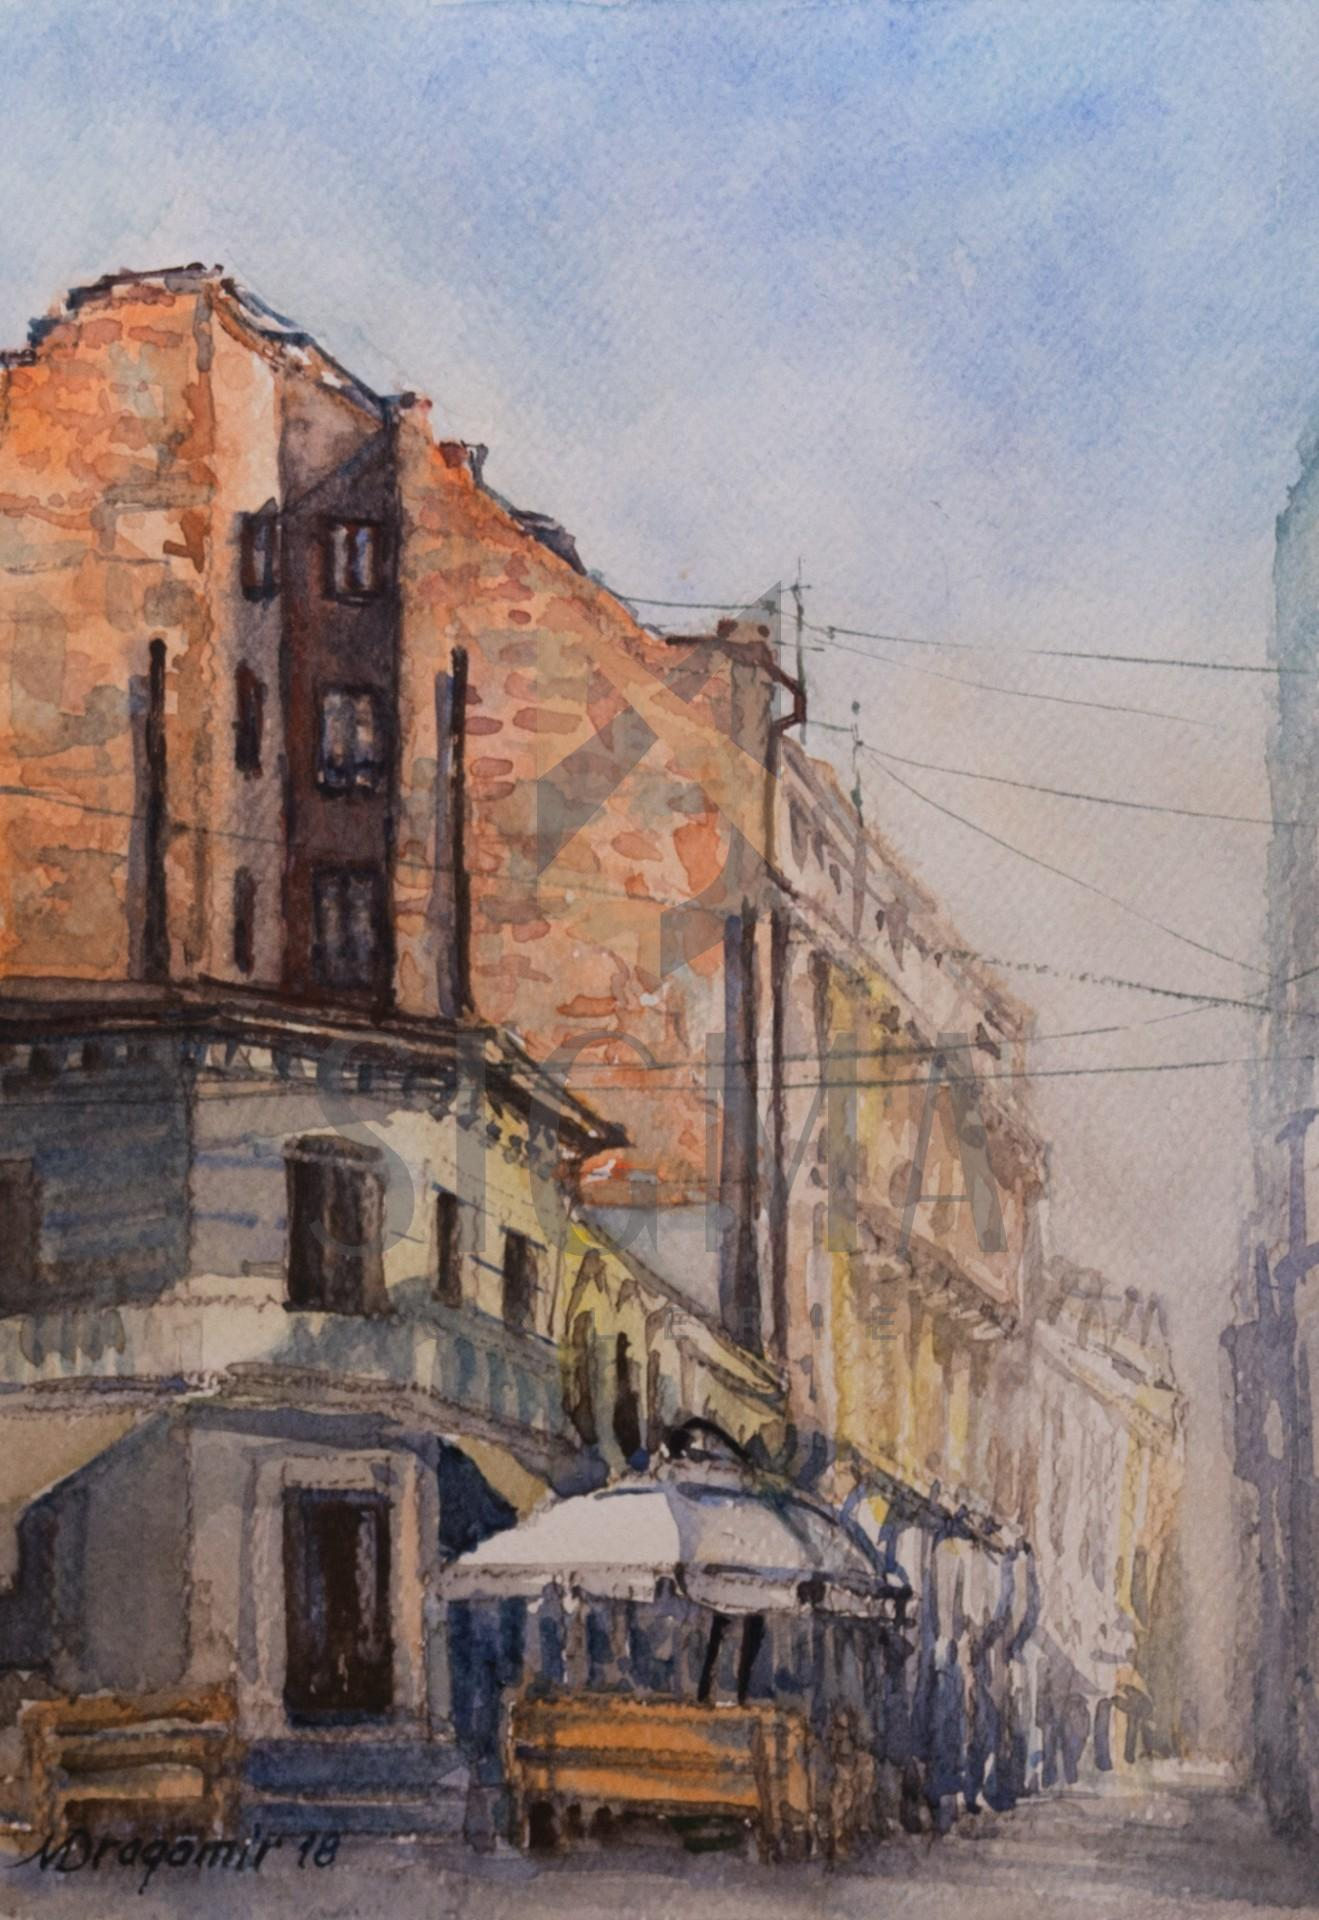 Tablou, Mihaela Dragomir, - Strada Franceza - acuarela, 28x19,5 cm